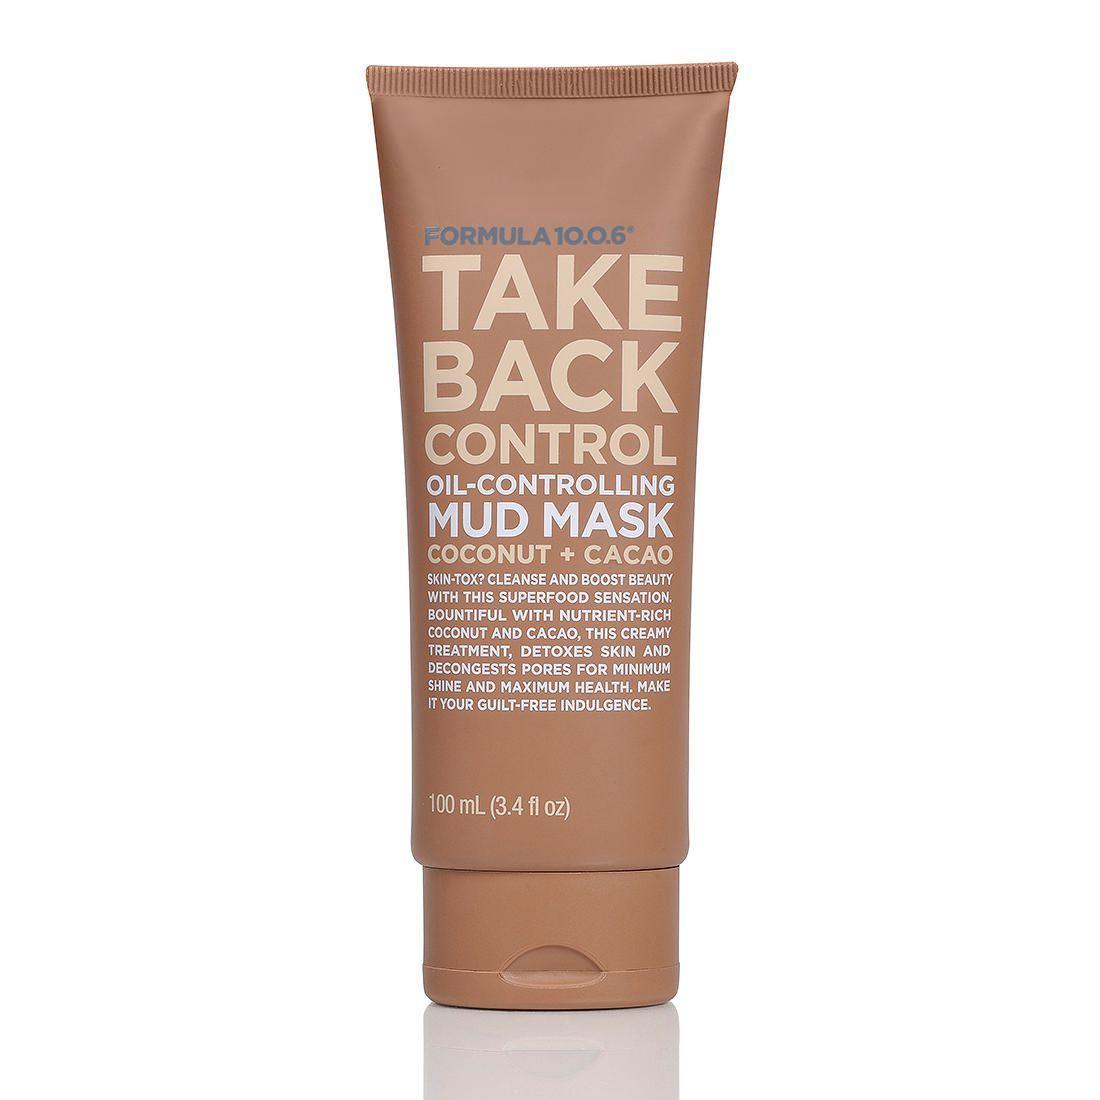 Formula 10 0 6 Take Back Control Mud Mask Target Australia Mud Mask Skin Care Facial Skin Care Routine